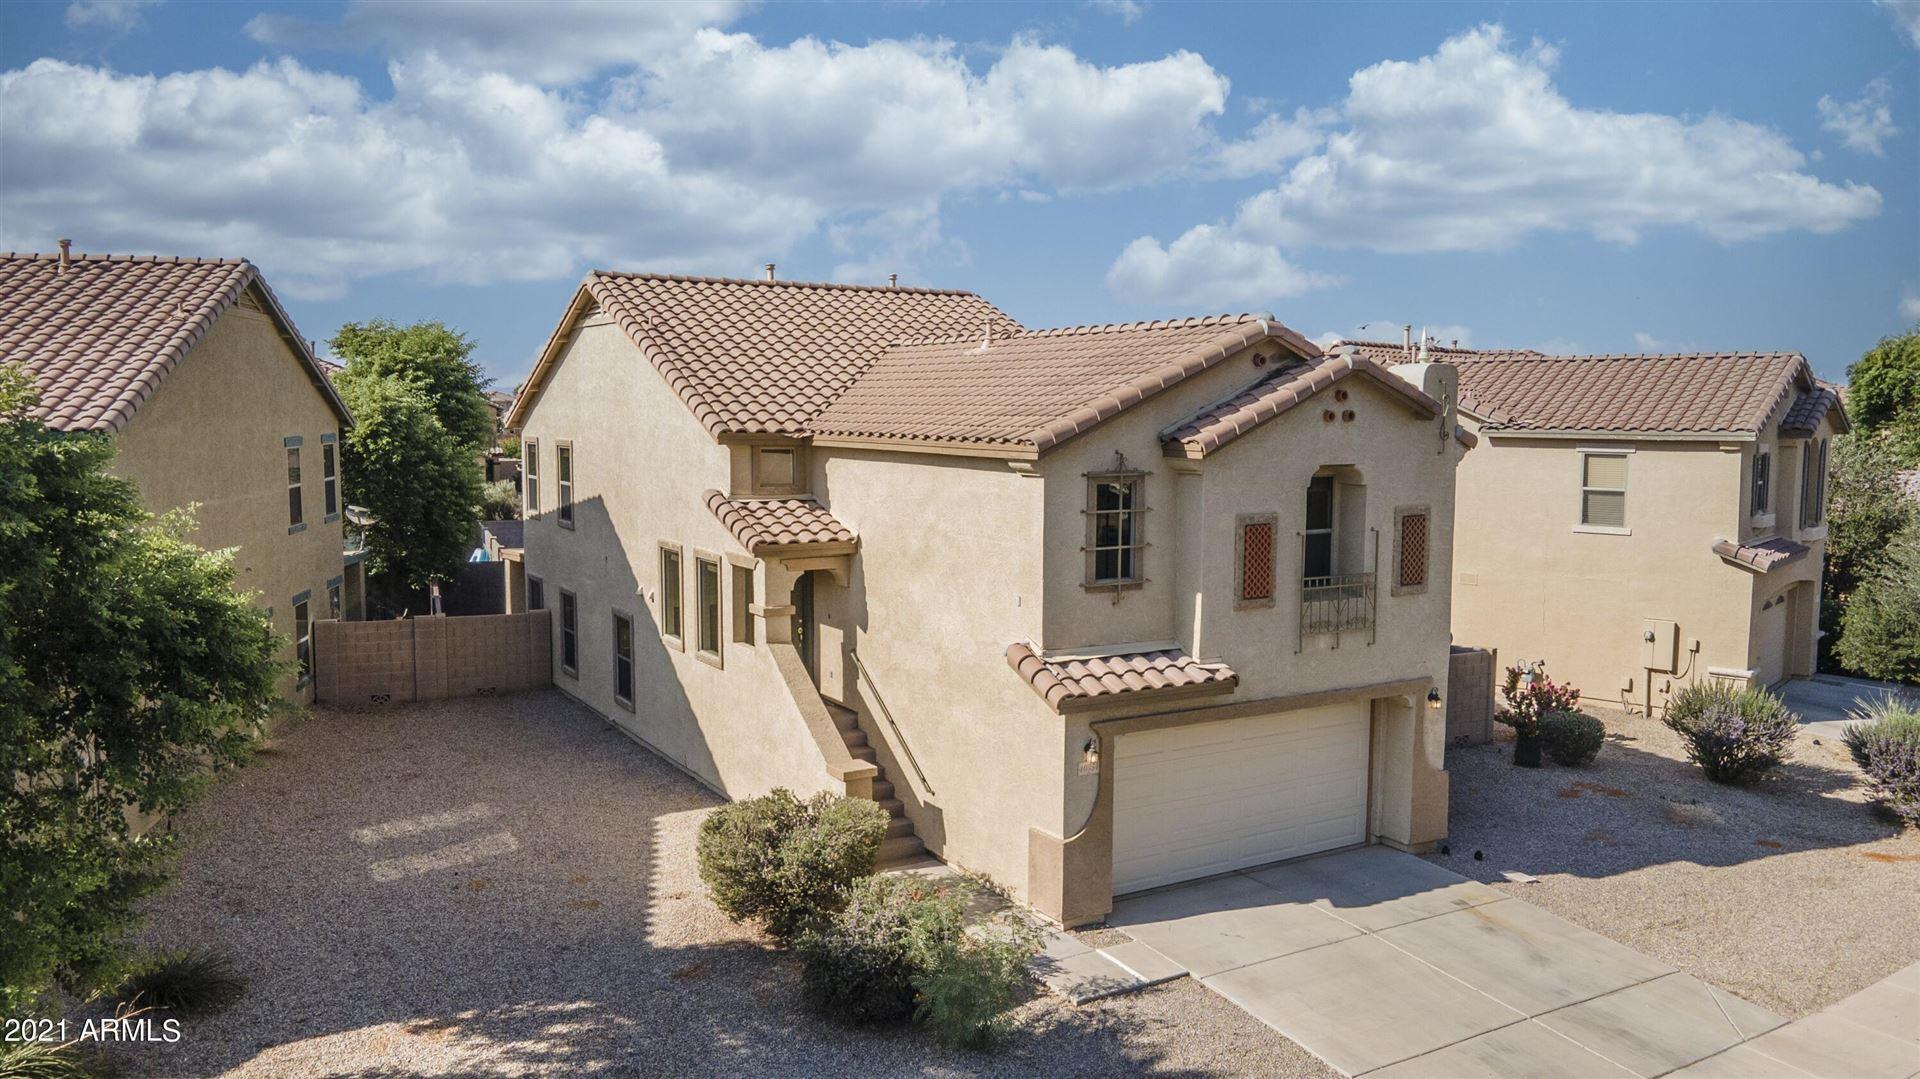 Photo of 40354 W HELEN Court, Maricopa, AZ 85138 (MLS # 6293511)